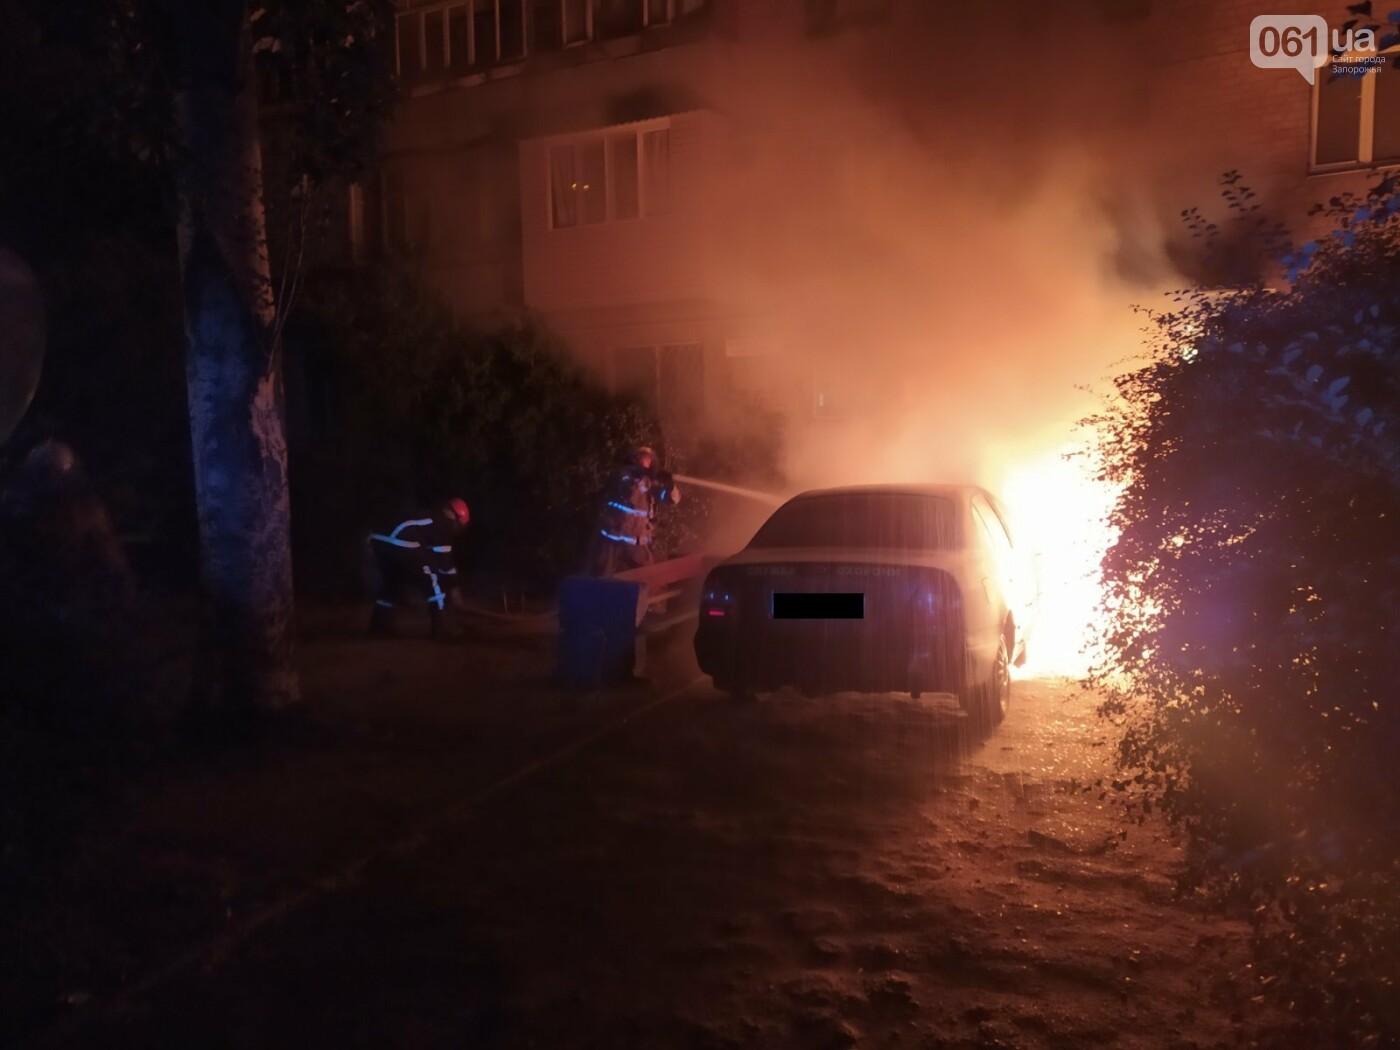 В Мелитополе во дворе жилого дома загорелась машина, - ФОТО, фото-1